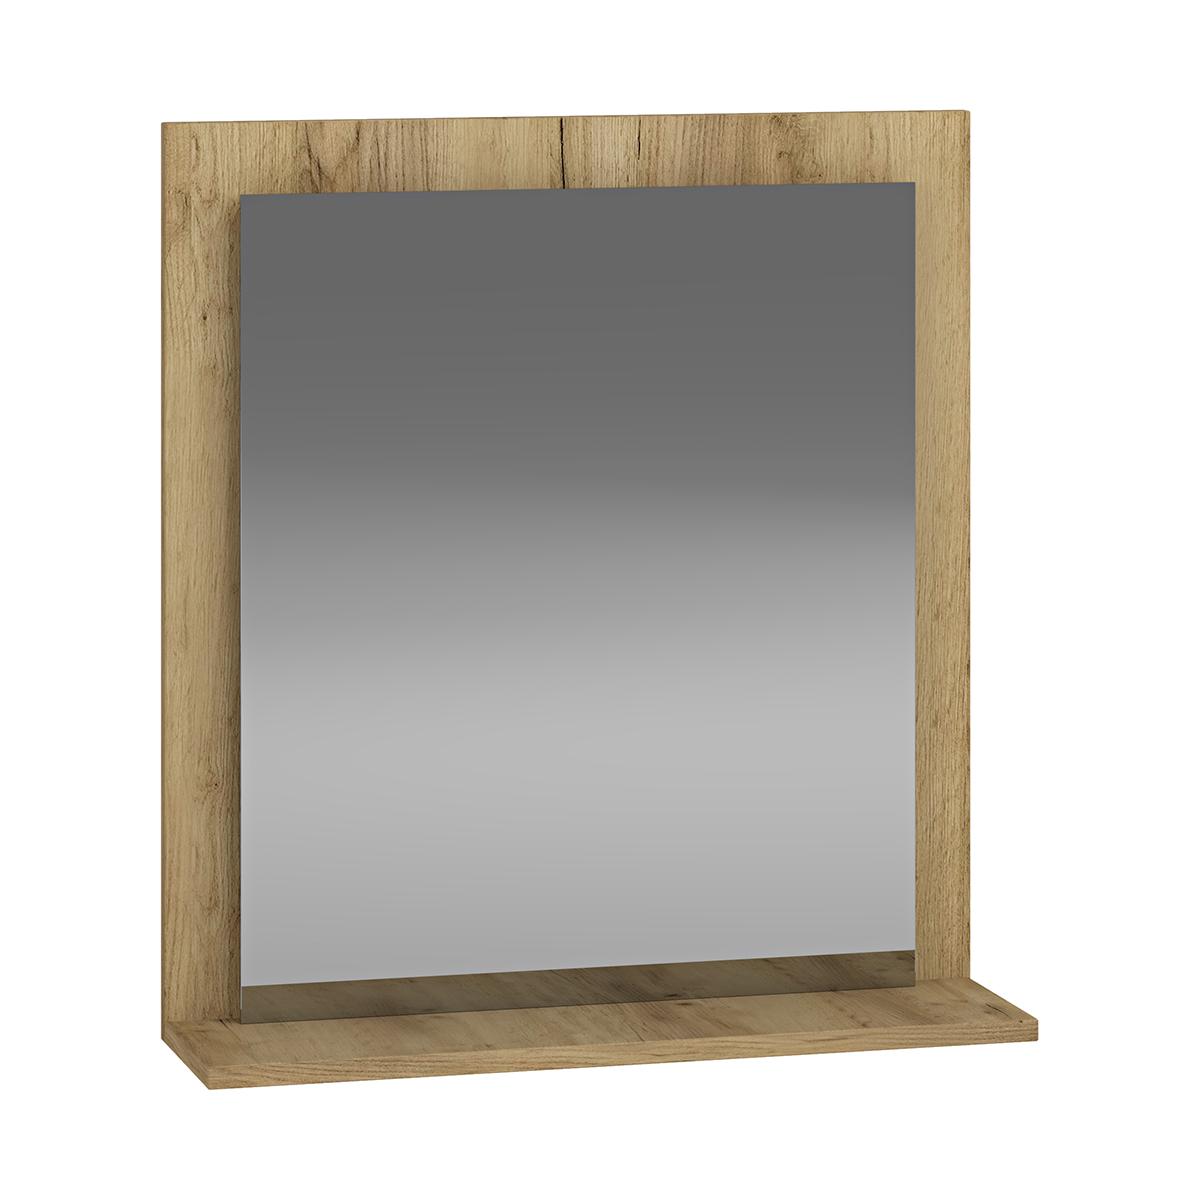 NABBI Baleta Z60 zrkadlo na stenu craft zlatý